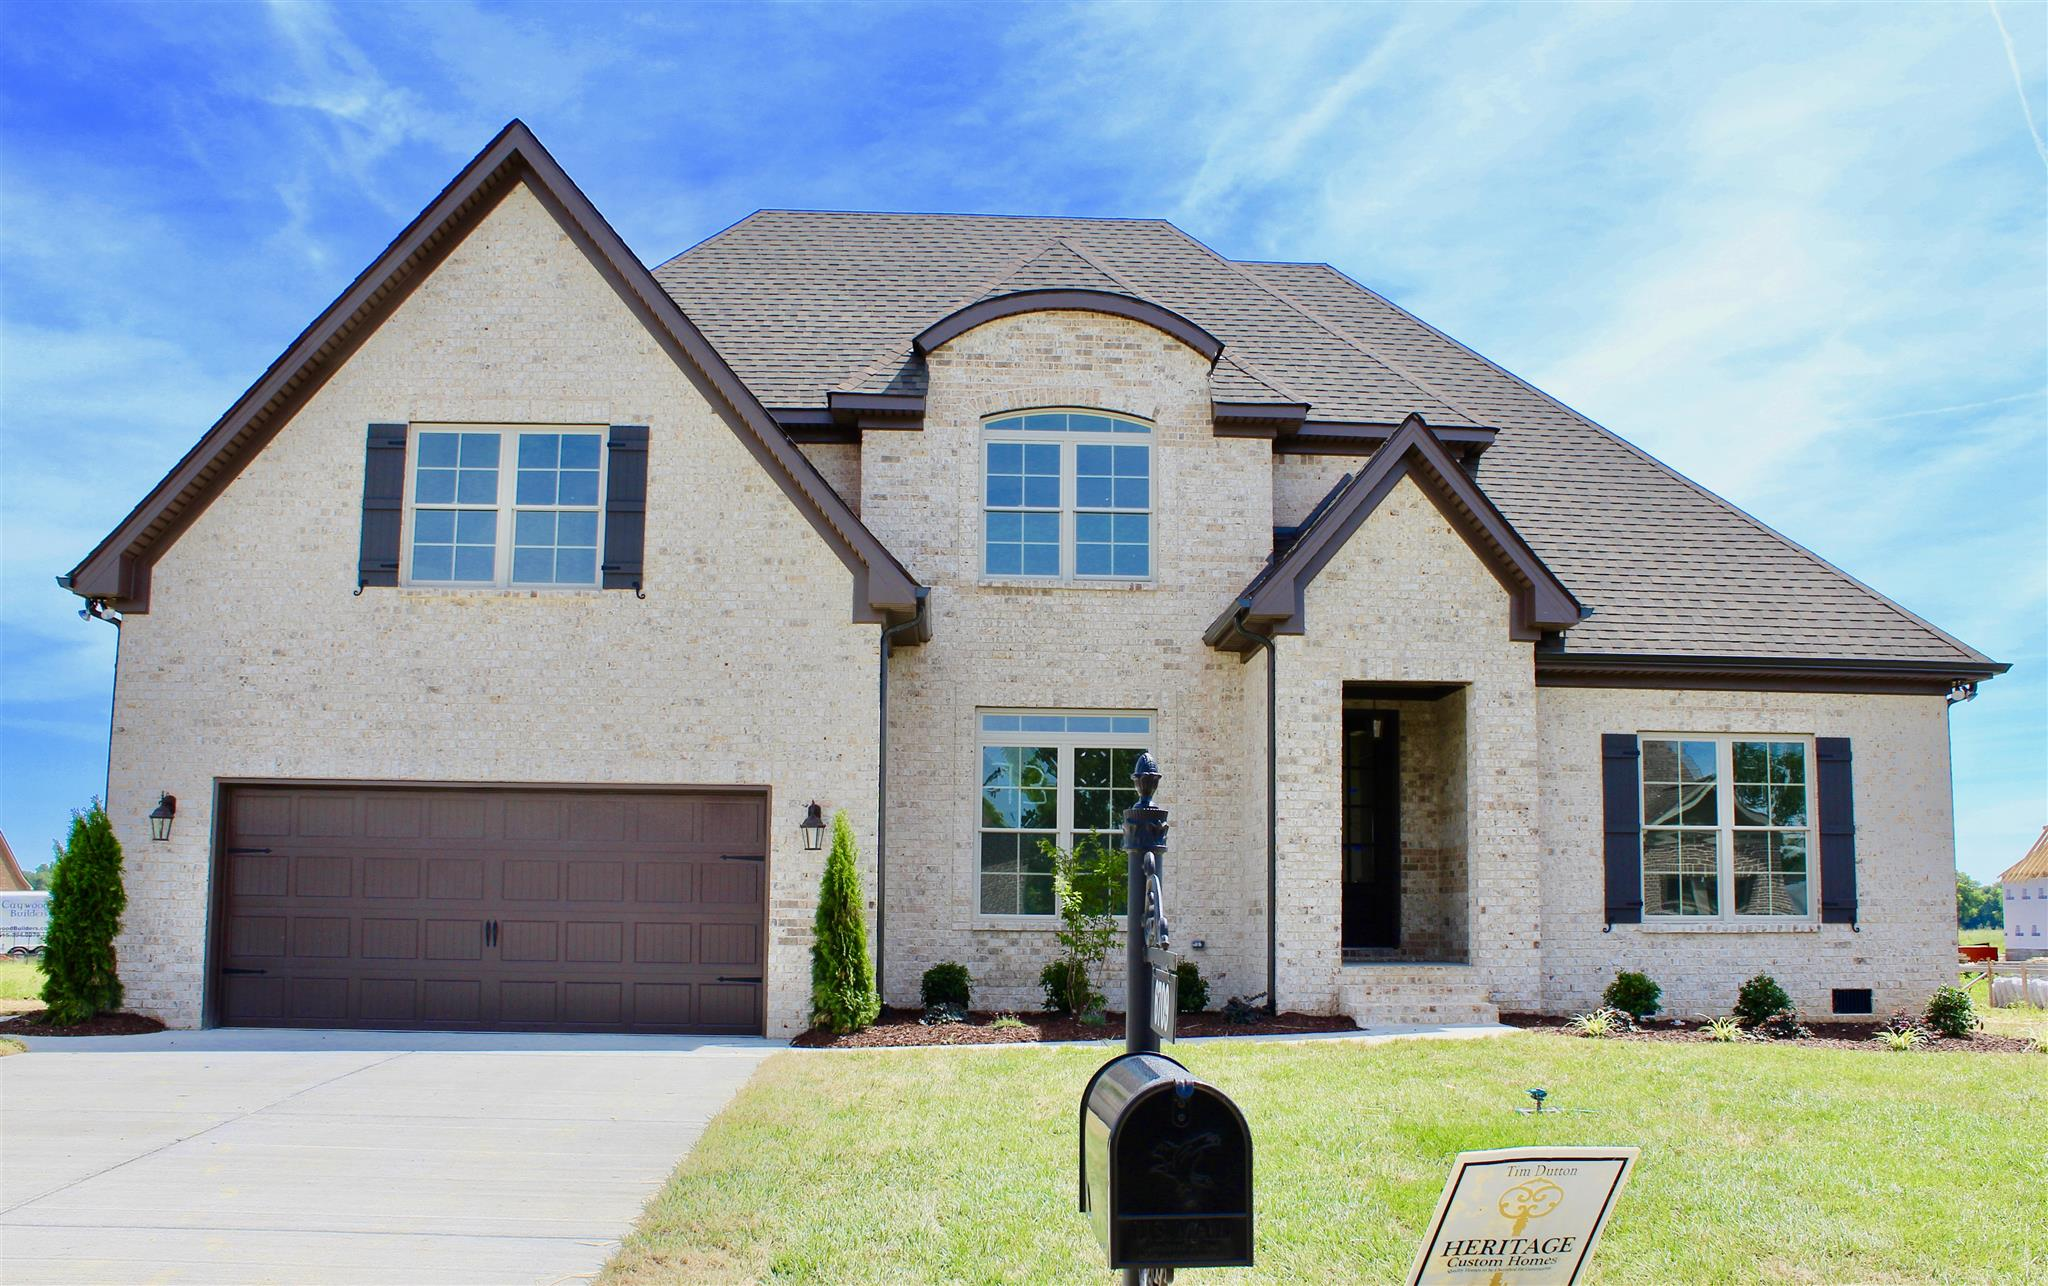 Photo of 5709 Iverson Drive Lot 73  Murfreesboro  TN